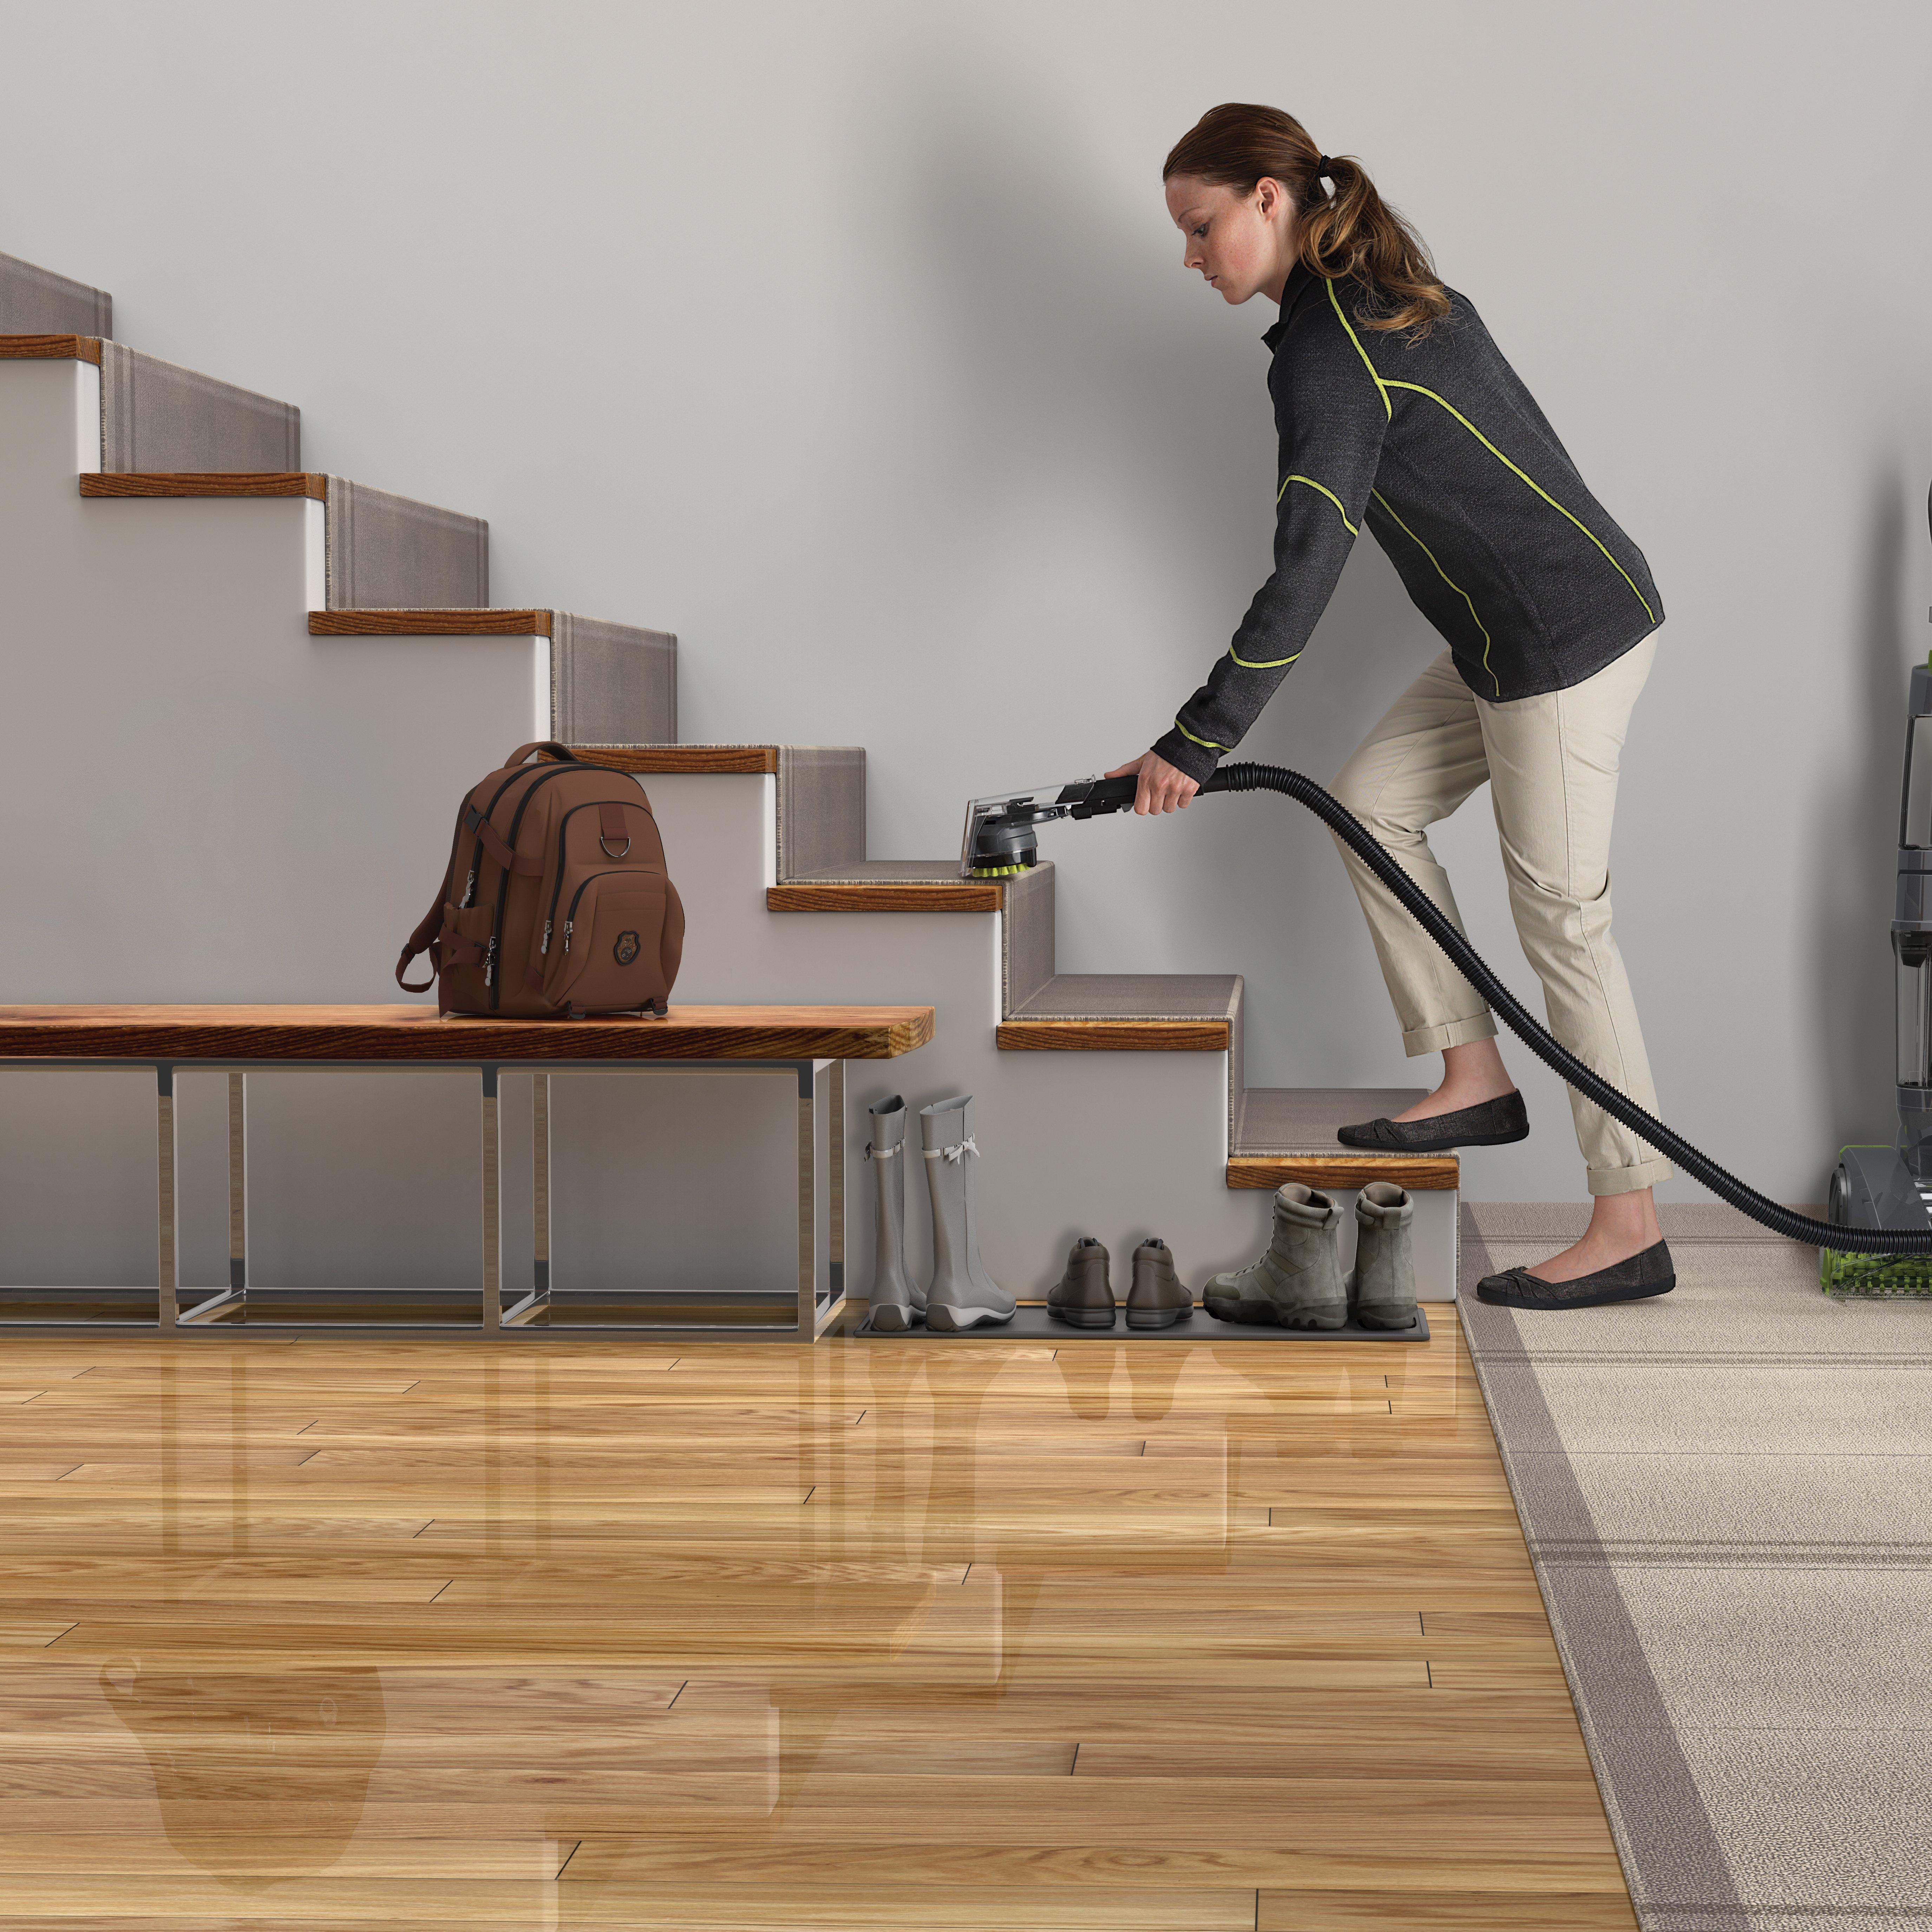 Dual Power Pro Carpet Cleaner5